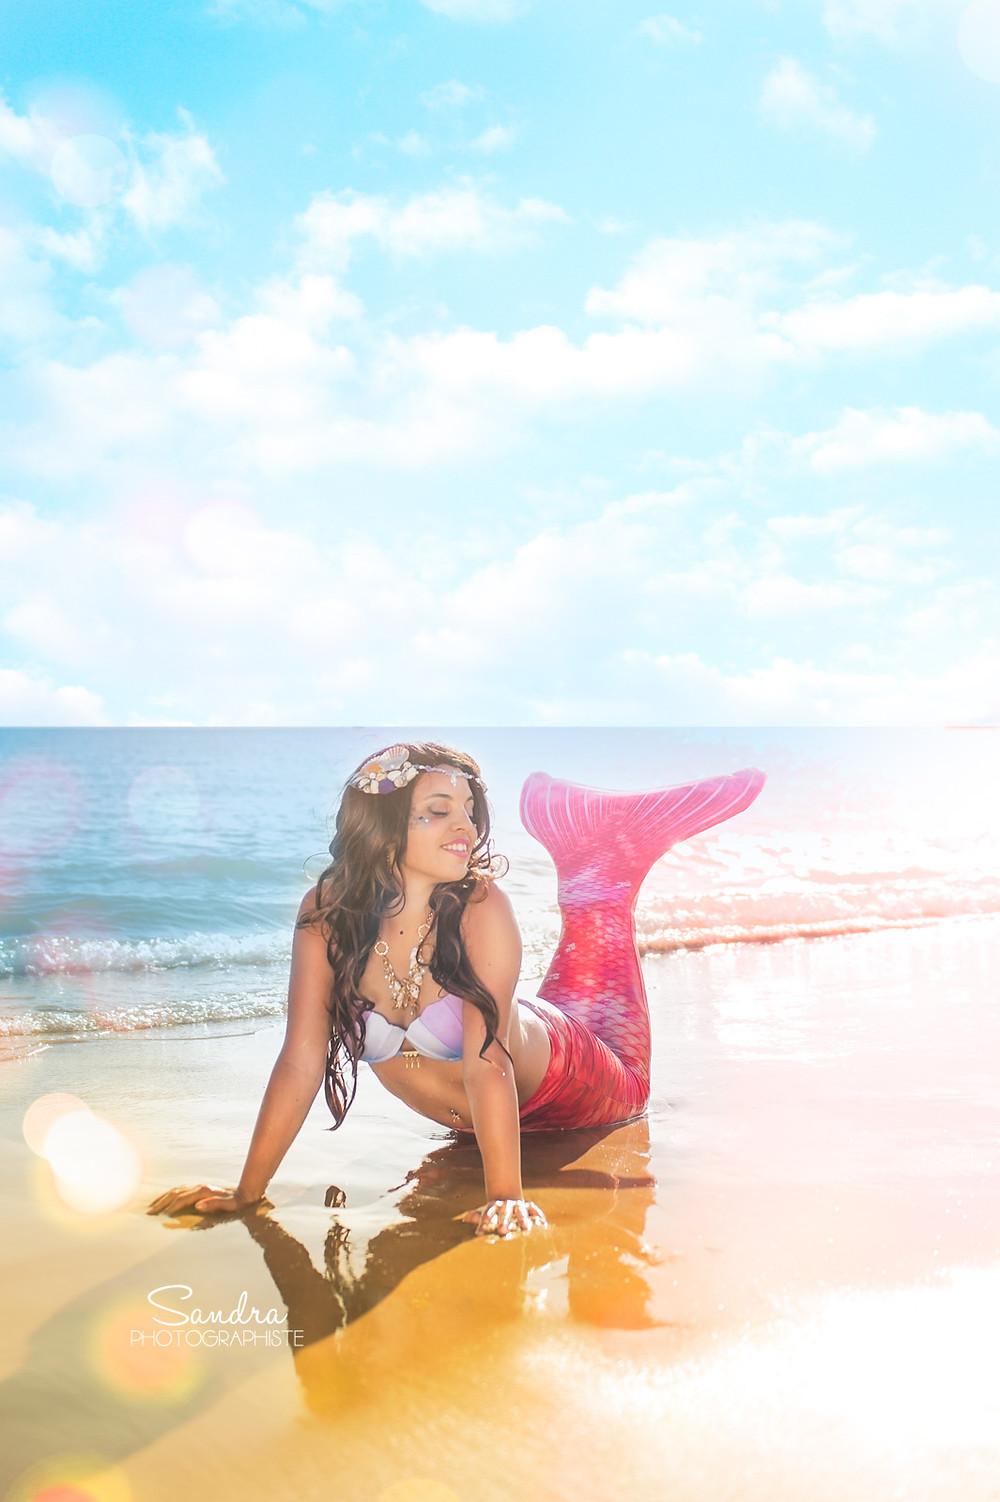 sirene photographe plage rose sable fille